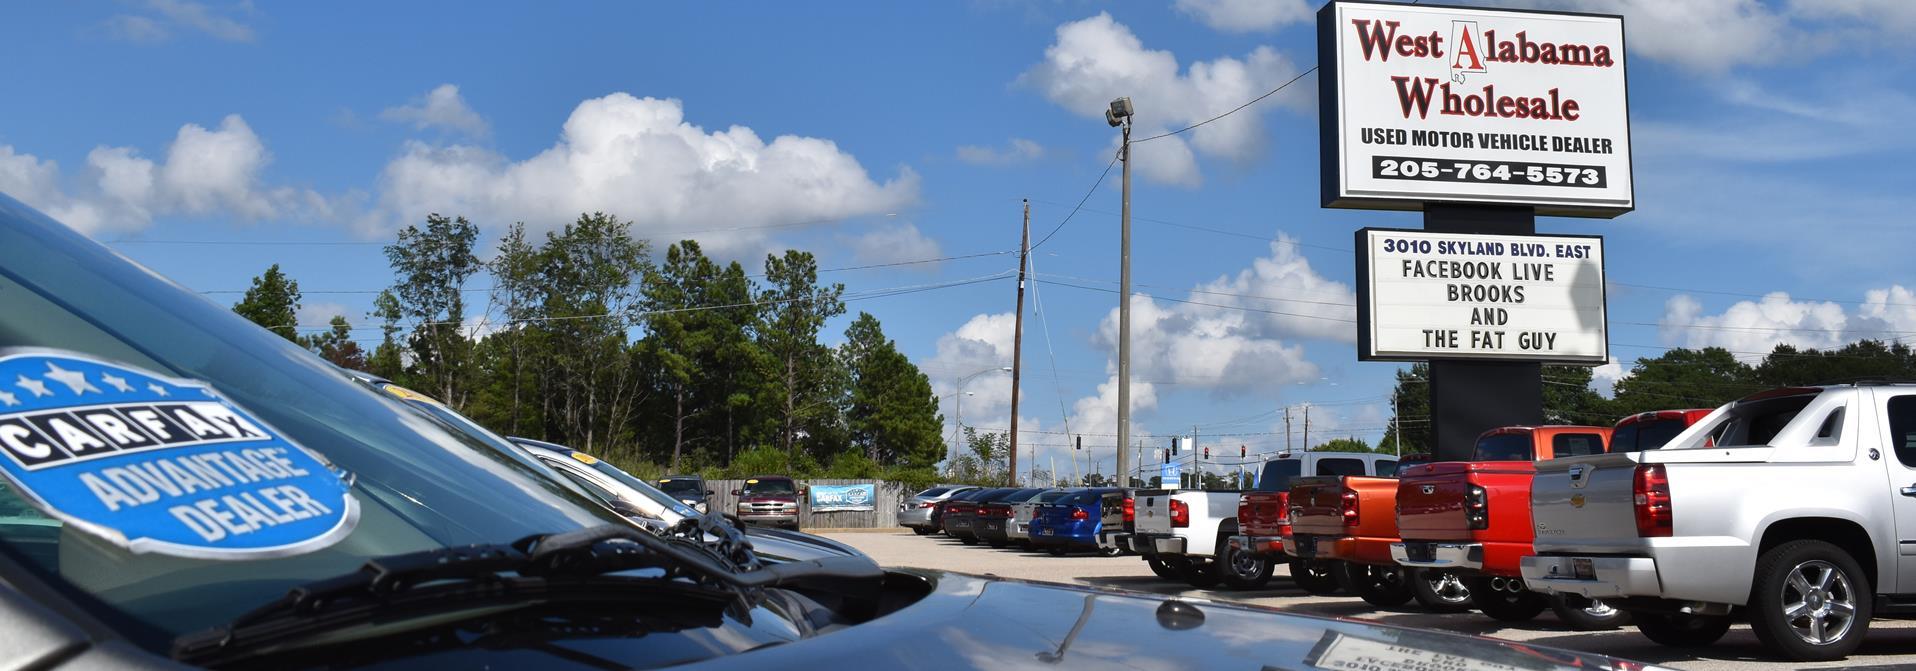 west alabama wholesale tuscaloosa al new used cars trucks sales service. Black Bedroom Furniture Sets. Home Design Ideas